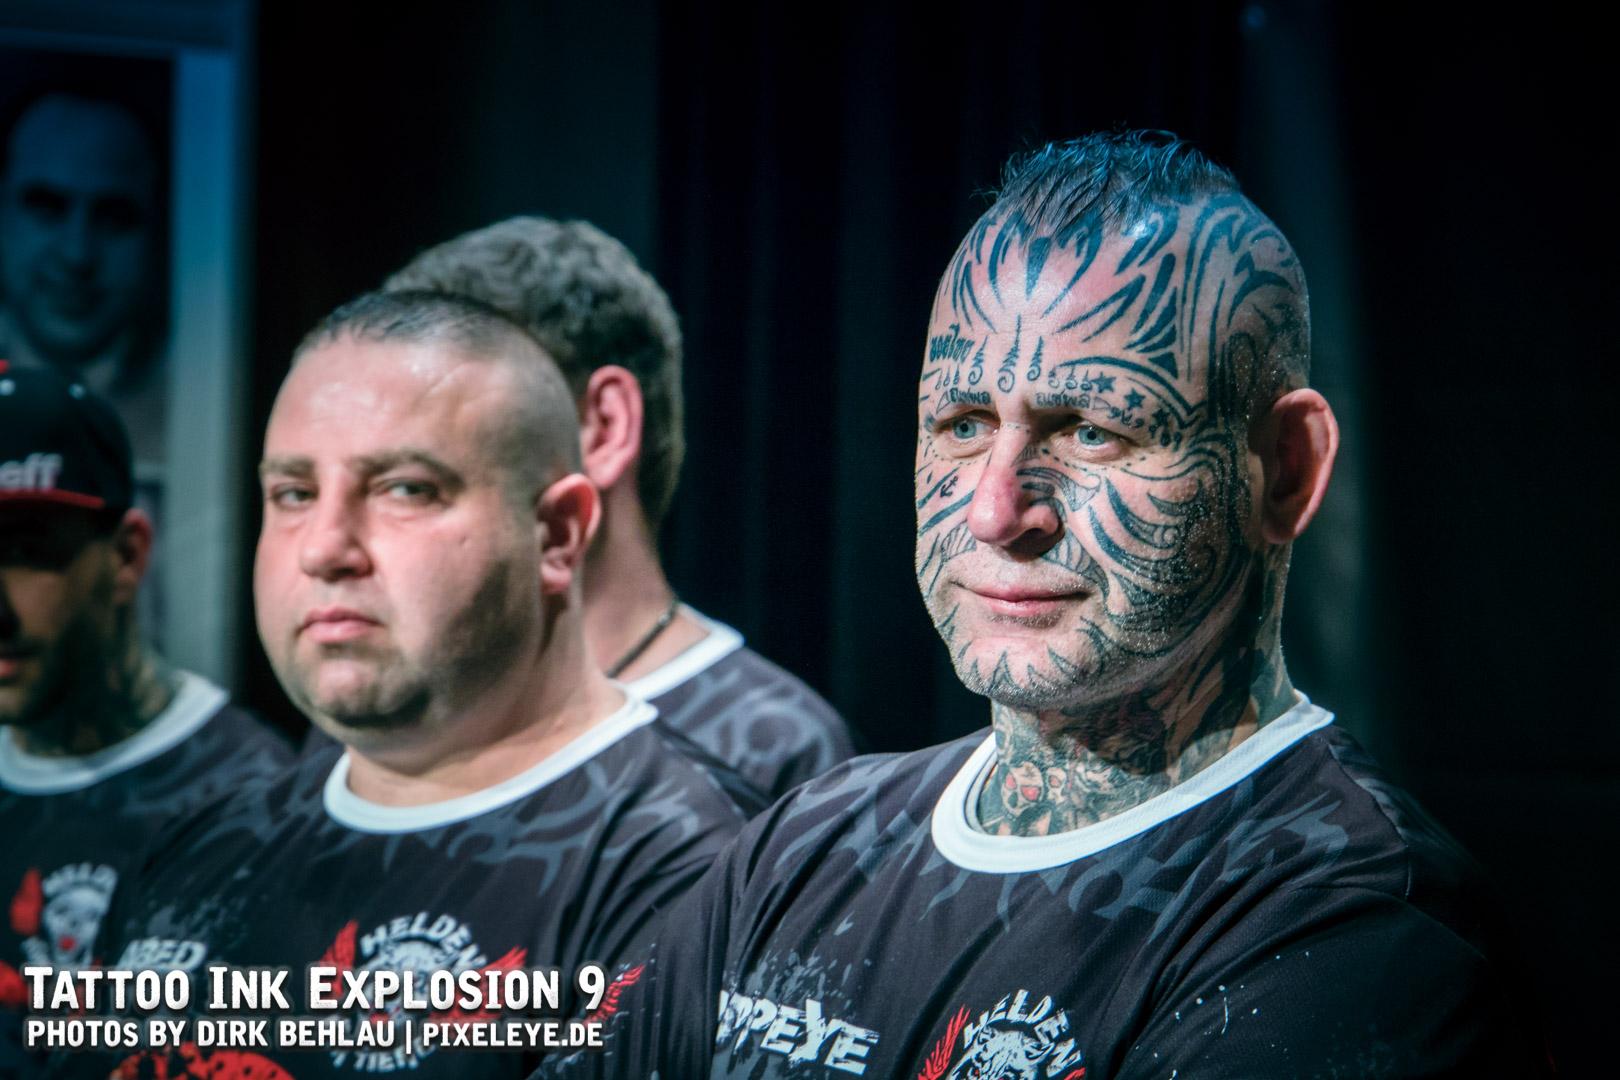 Tattoo Ink Explosion 2018 WEB by Dirk Behlau-0476.jpg